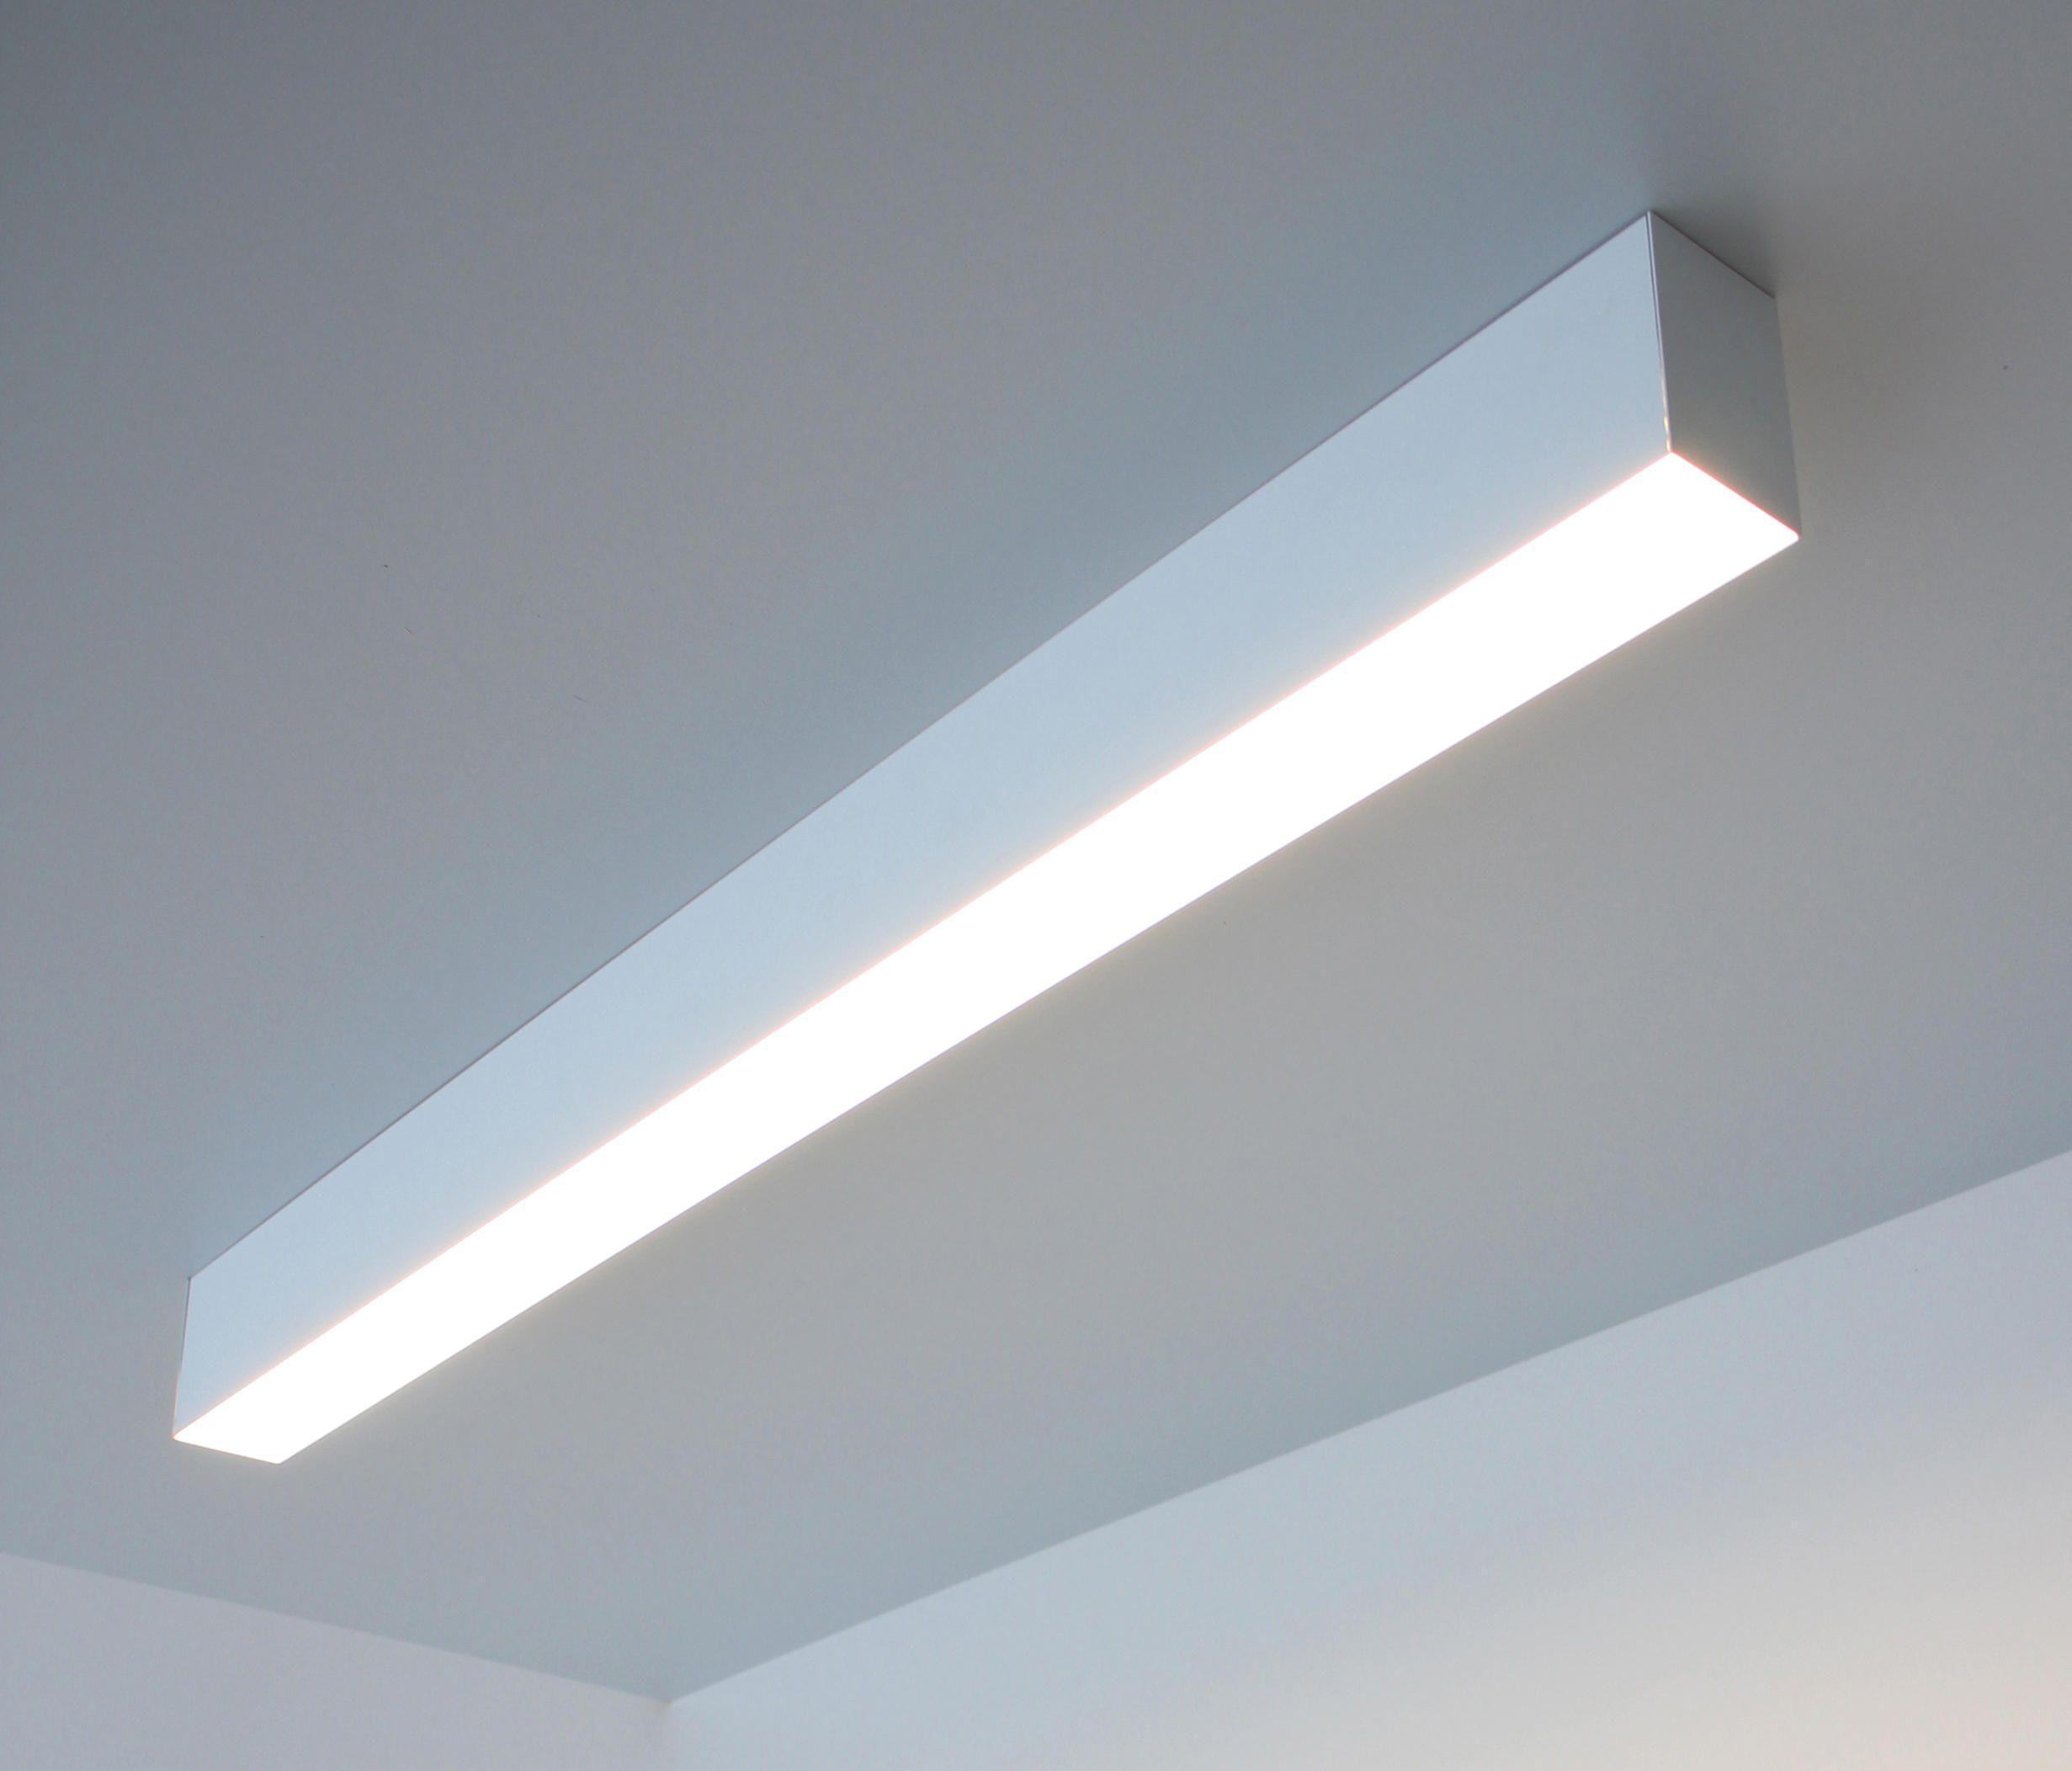 Pin by Protágoras Freire on Light | Pinterest | Lights